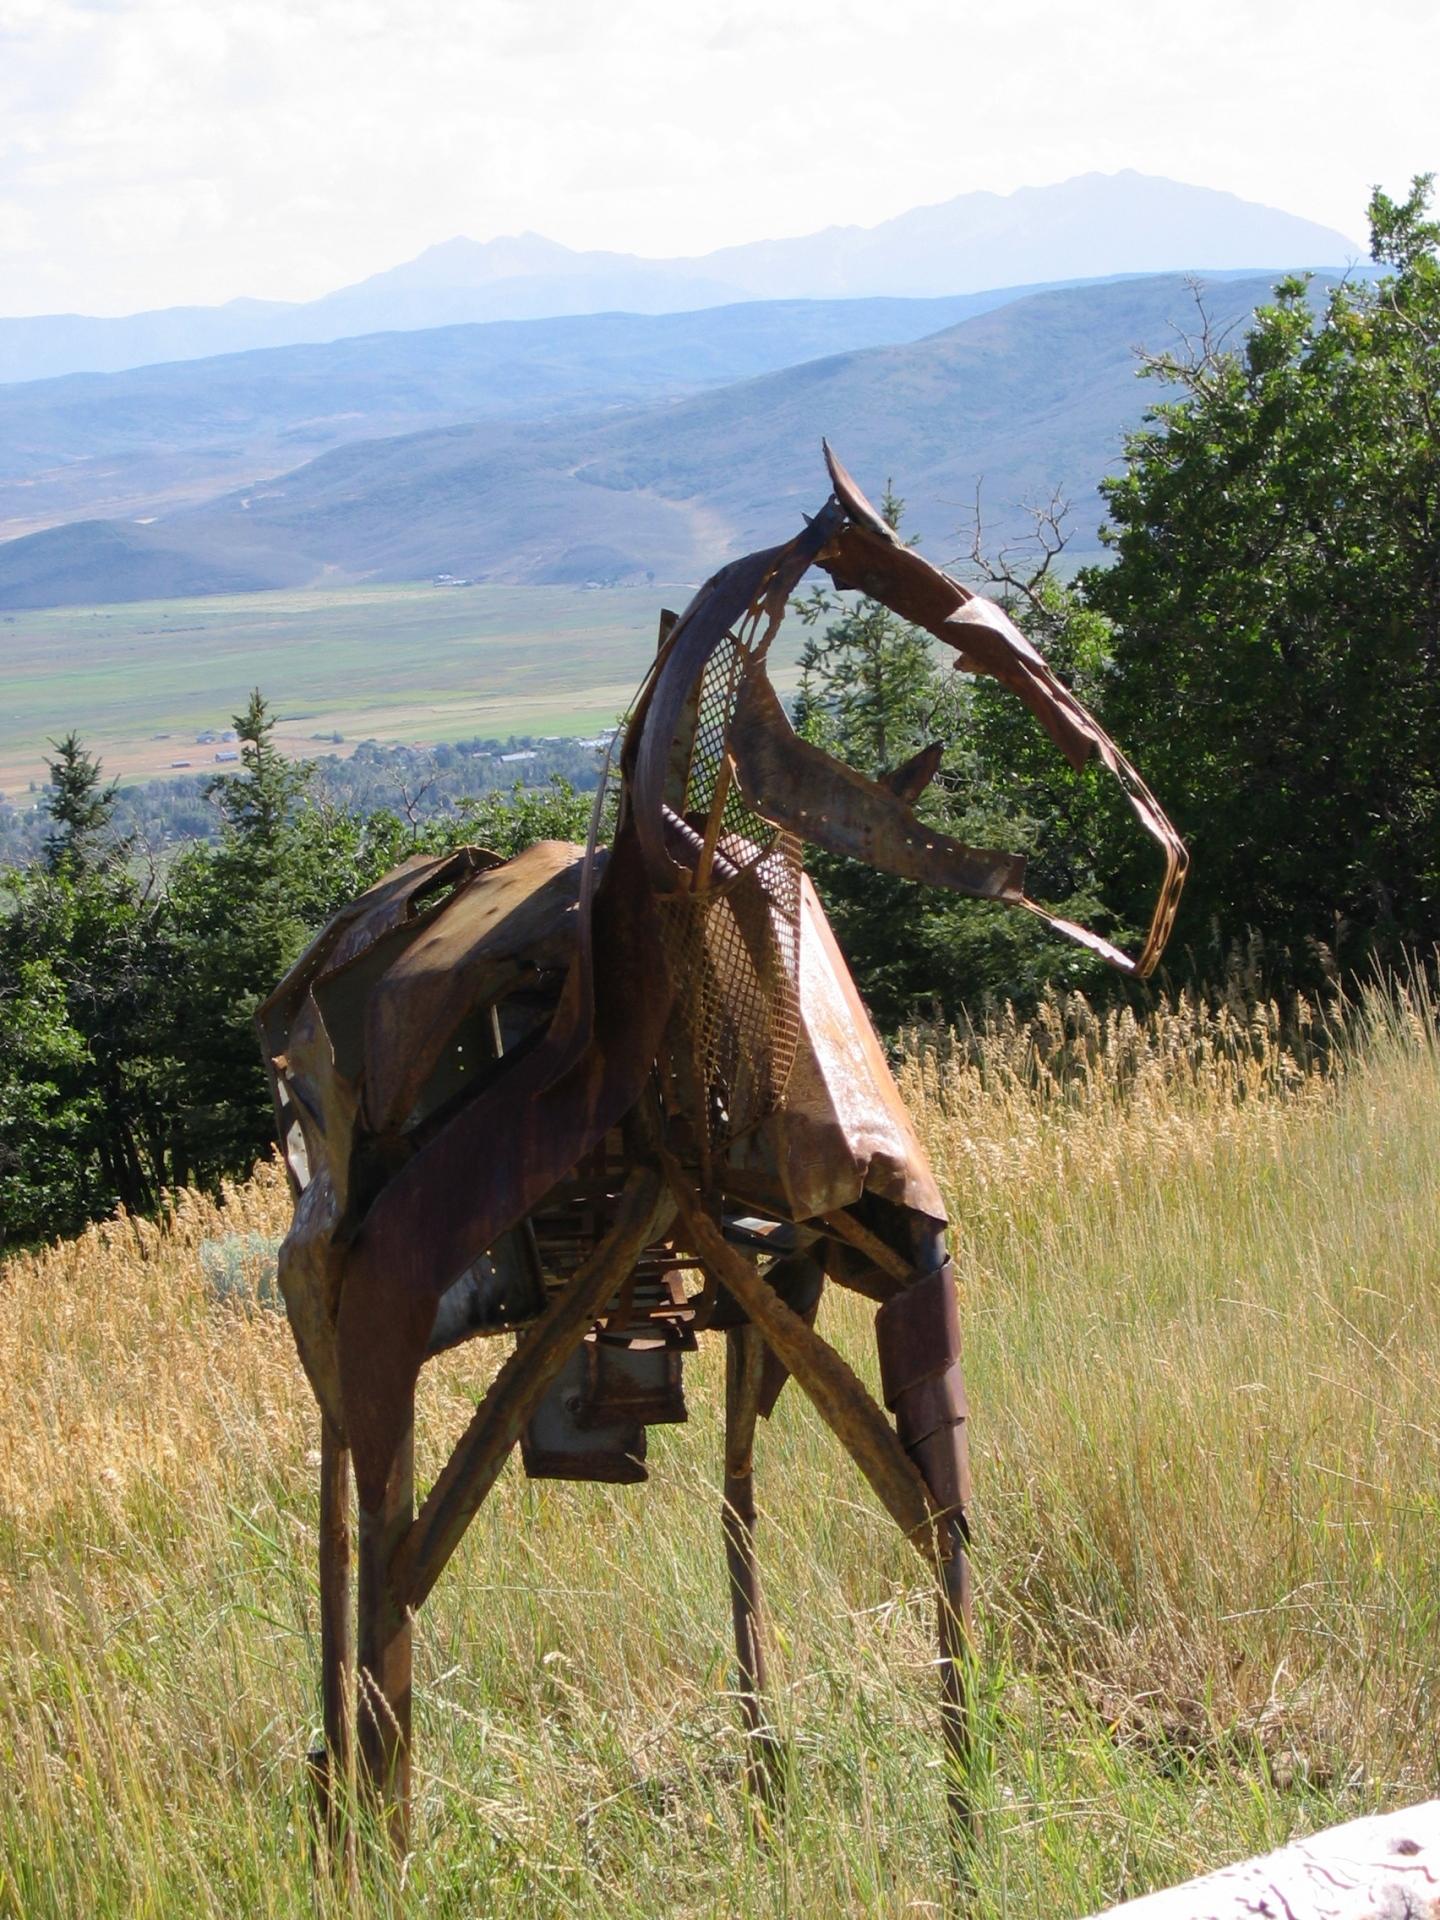 Life size steel horse sculpture, Utah, Rusty Croft, Carmel California